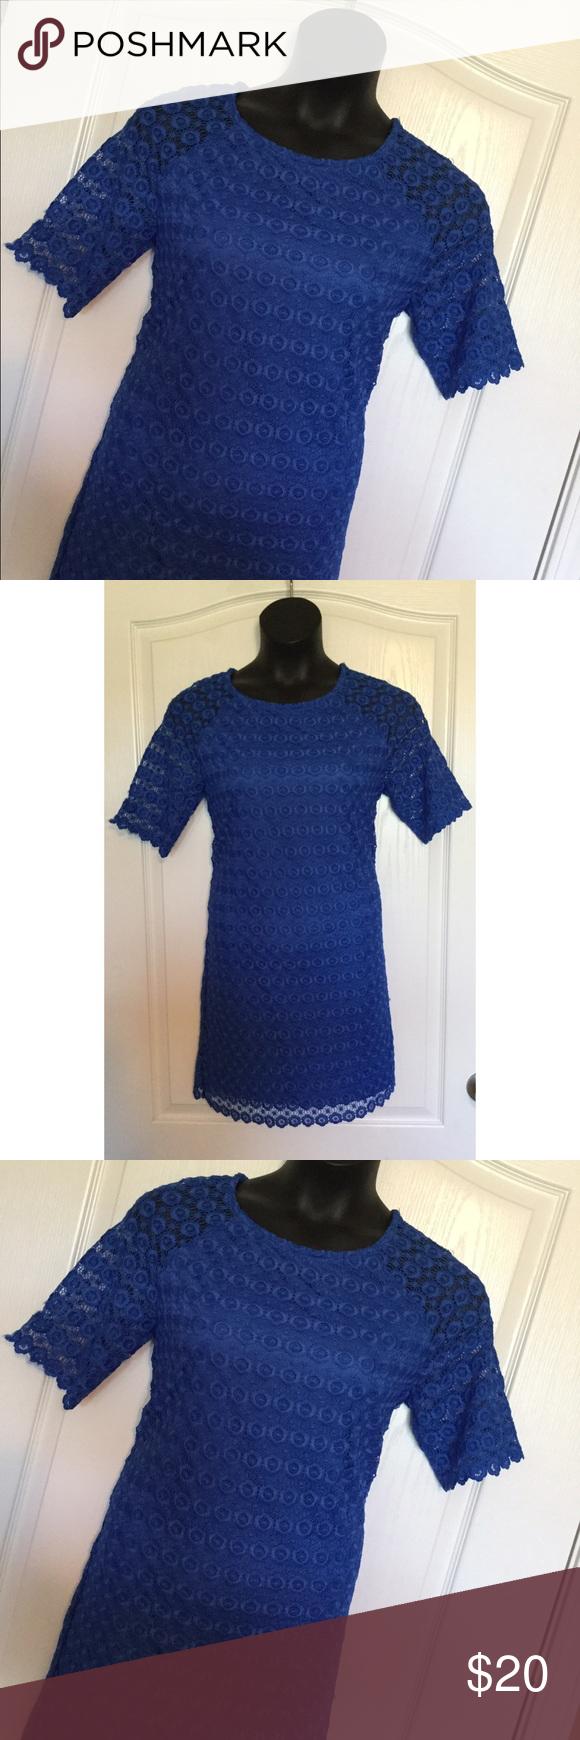 Cobolt blue embroidery shift dress. Floral  embroidery shift dress. Cato Dresses